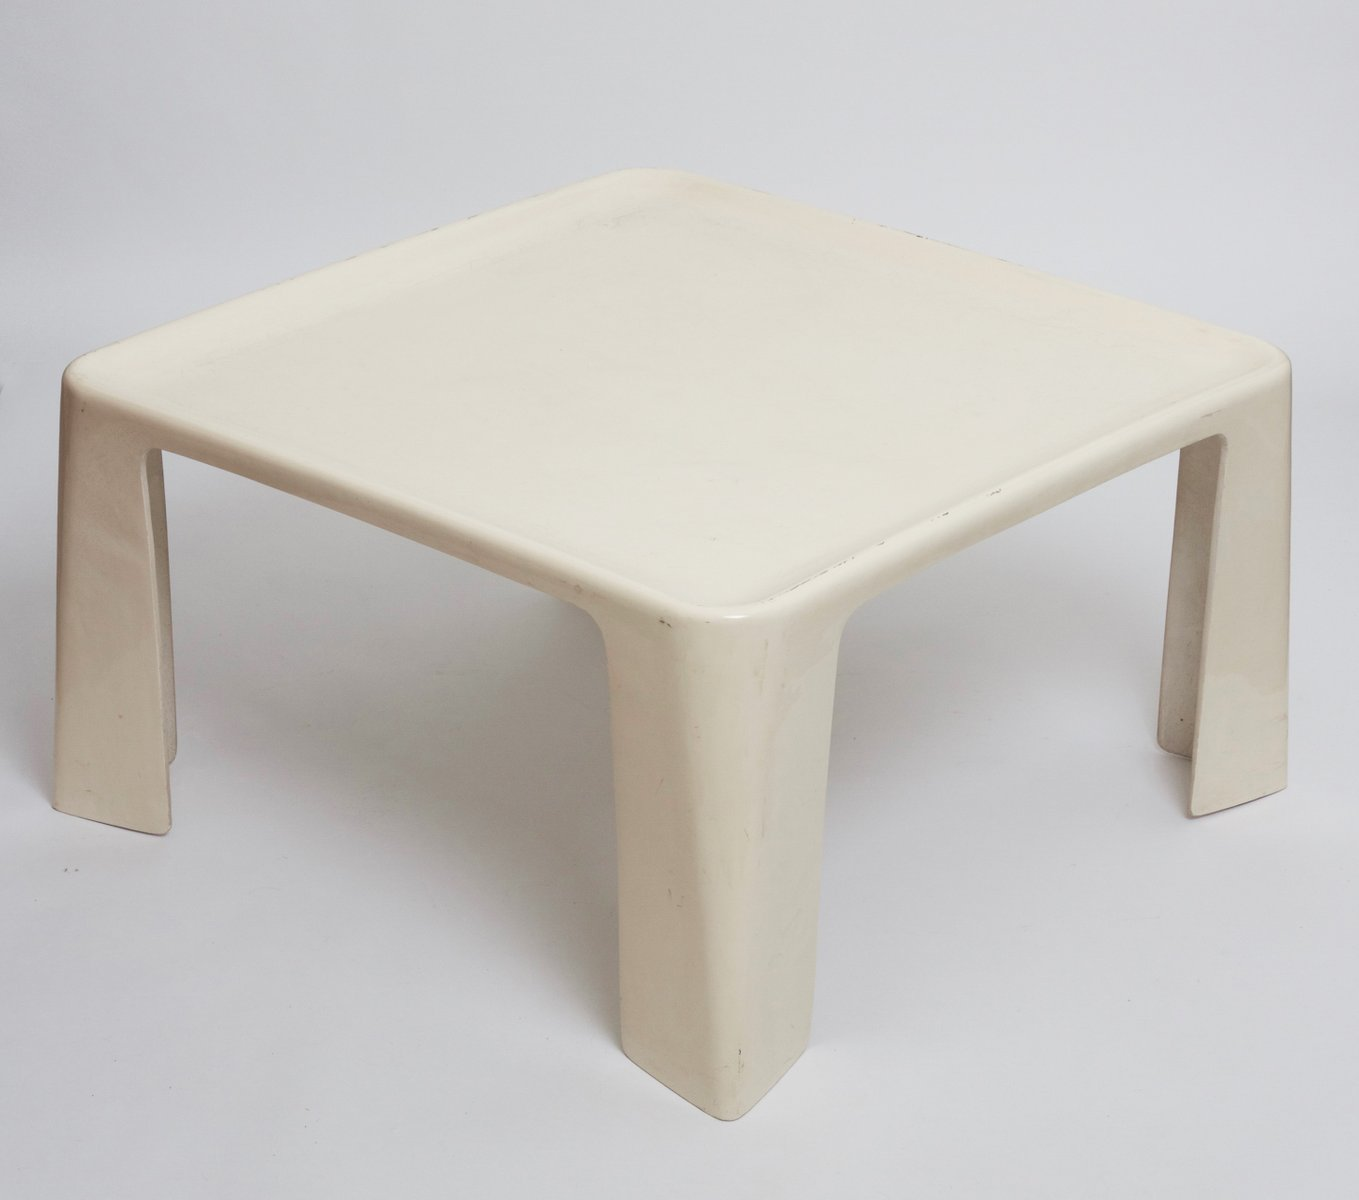 table basse amanta en fibre de verre par mario bellini. Black Bedroom Furniture Sets. Home Design Ideas